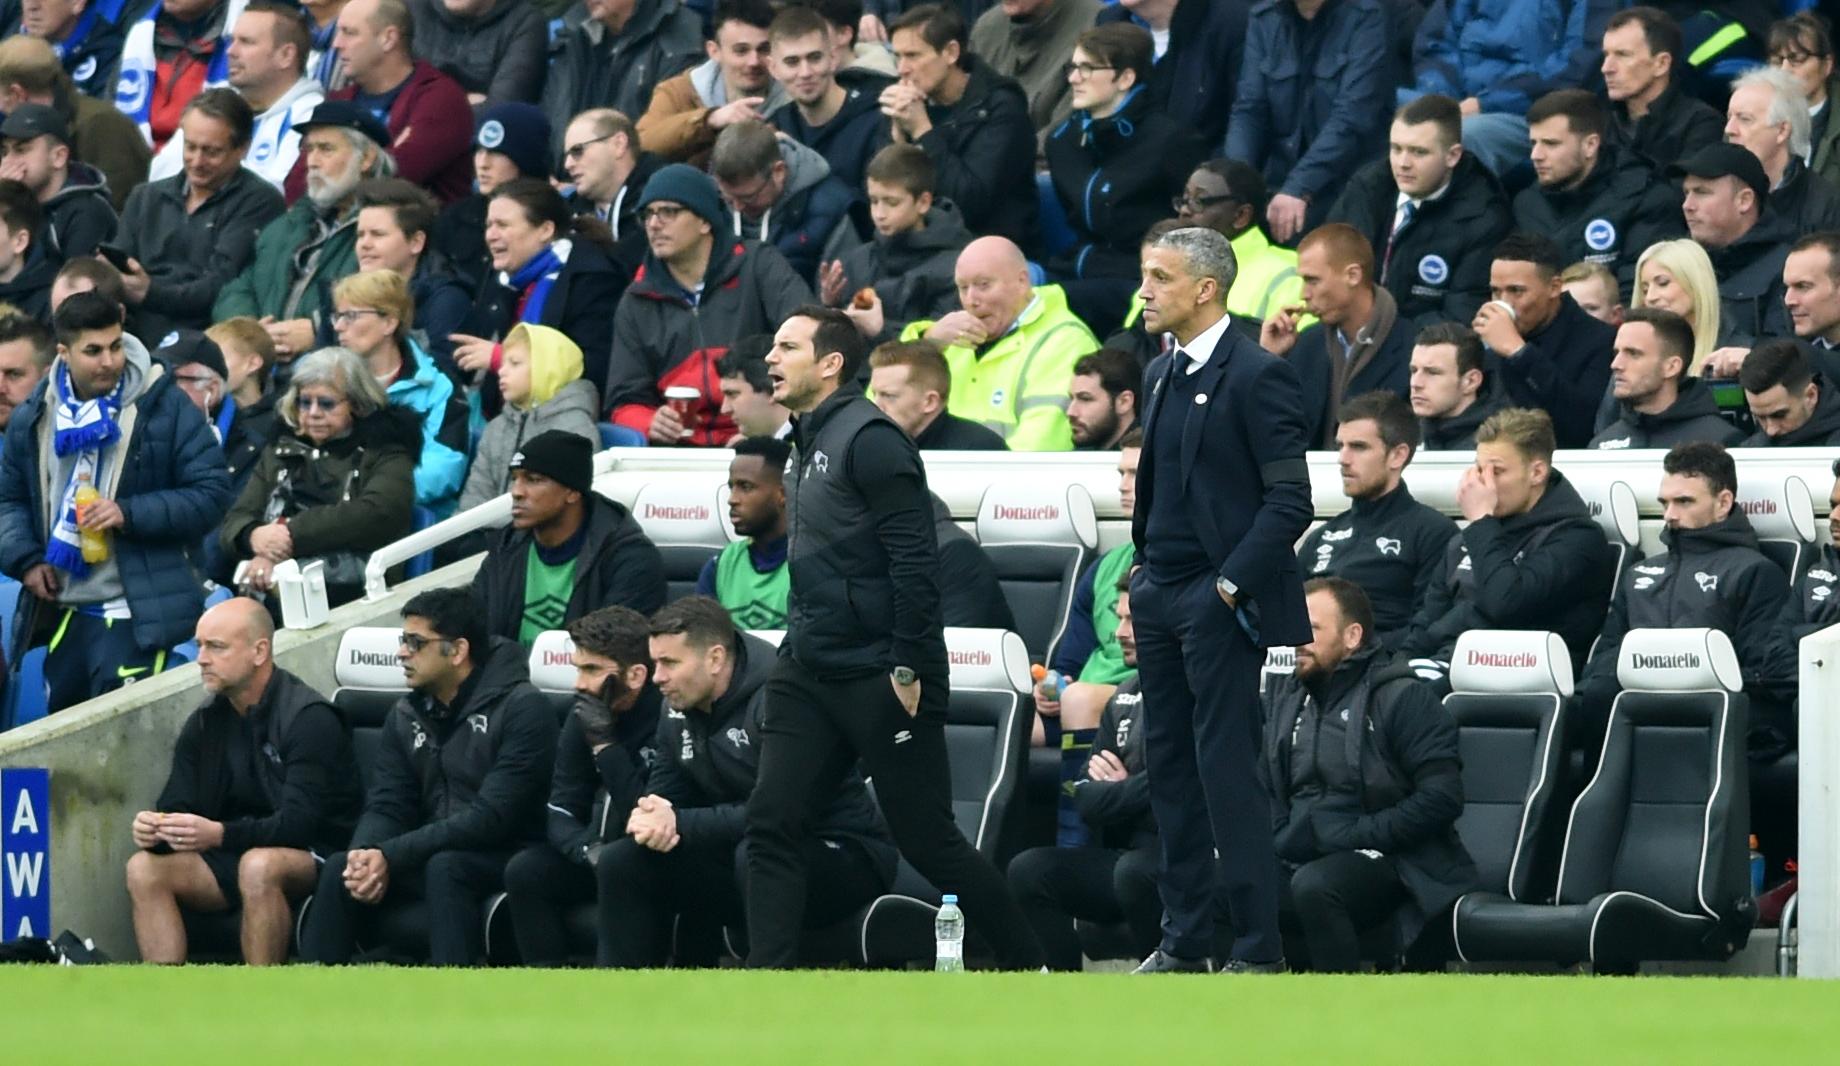 Hughton cautious about Albion's FA Cup chances